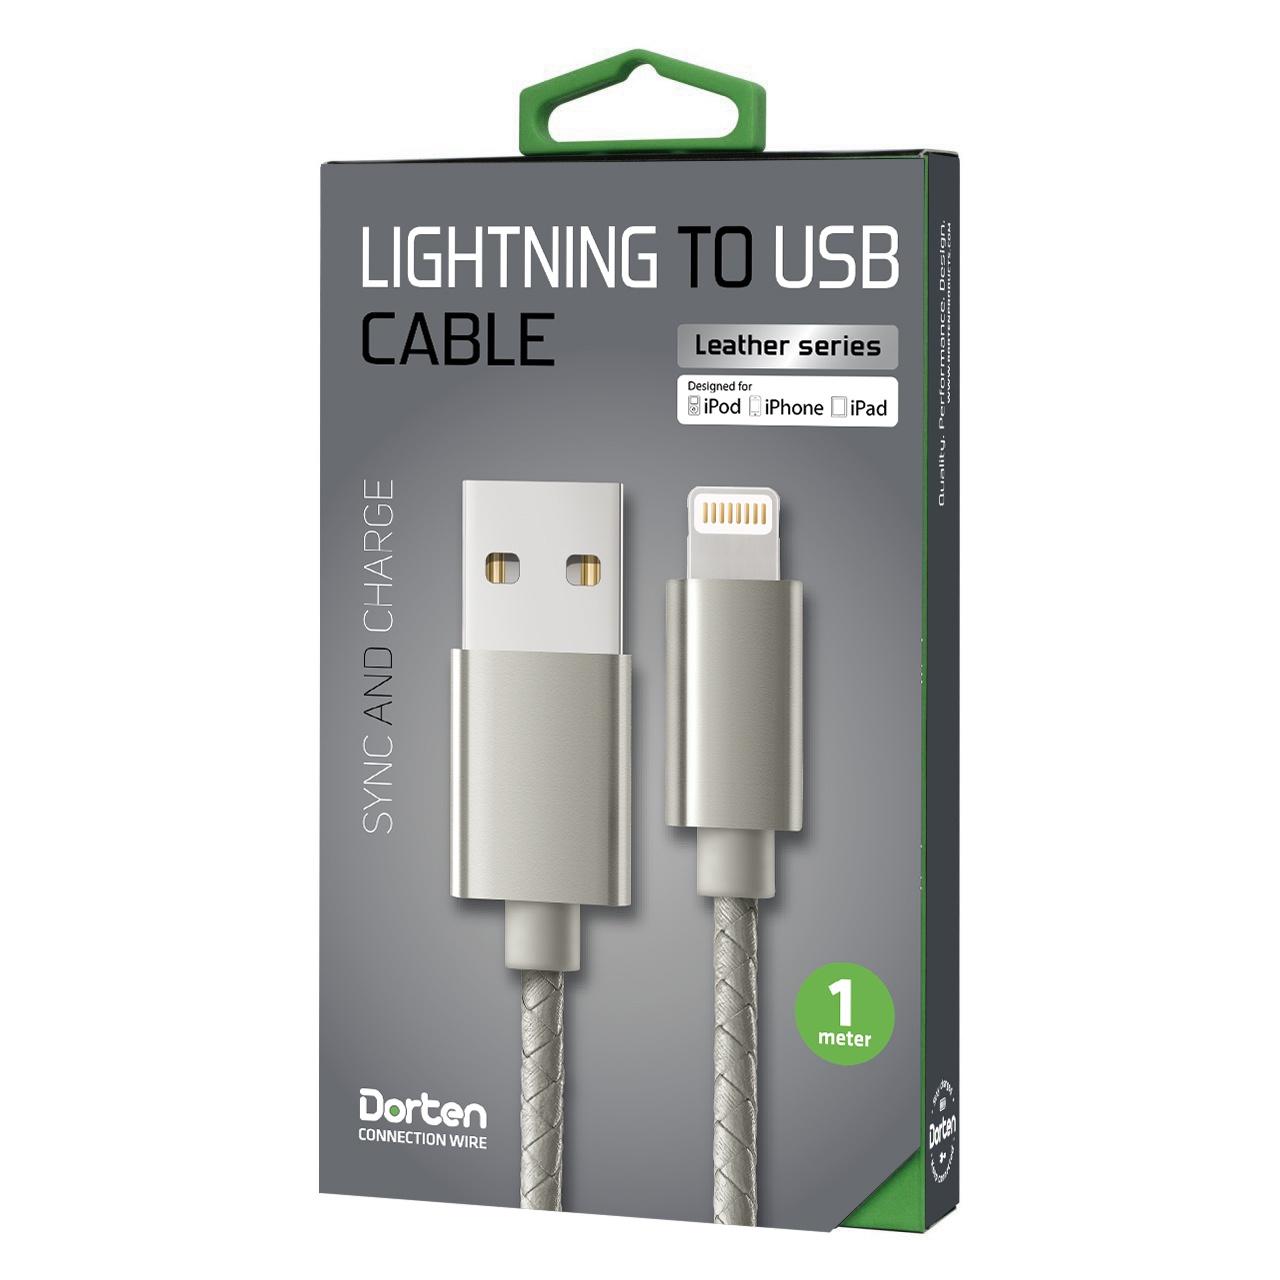 Кабель DORTEN Lighting to USB cable: Leather Series 1 meter, серый